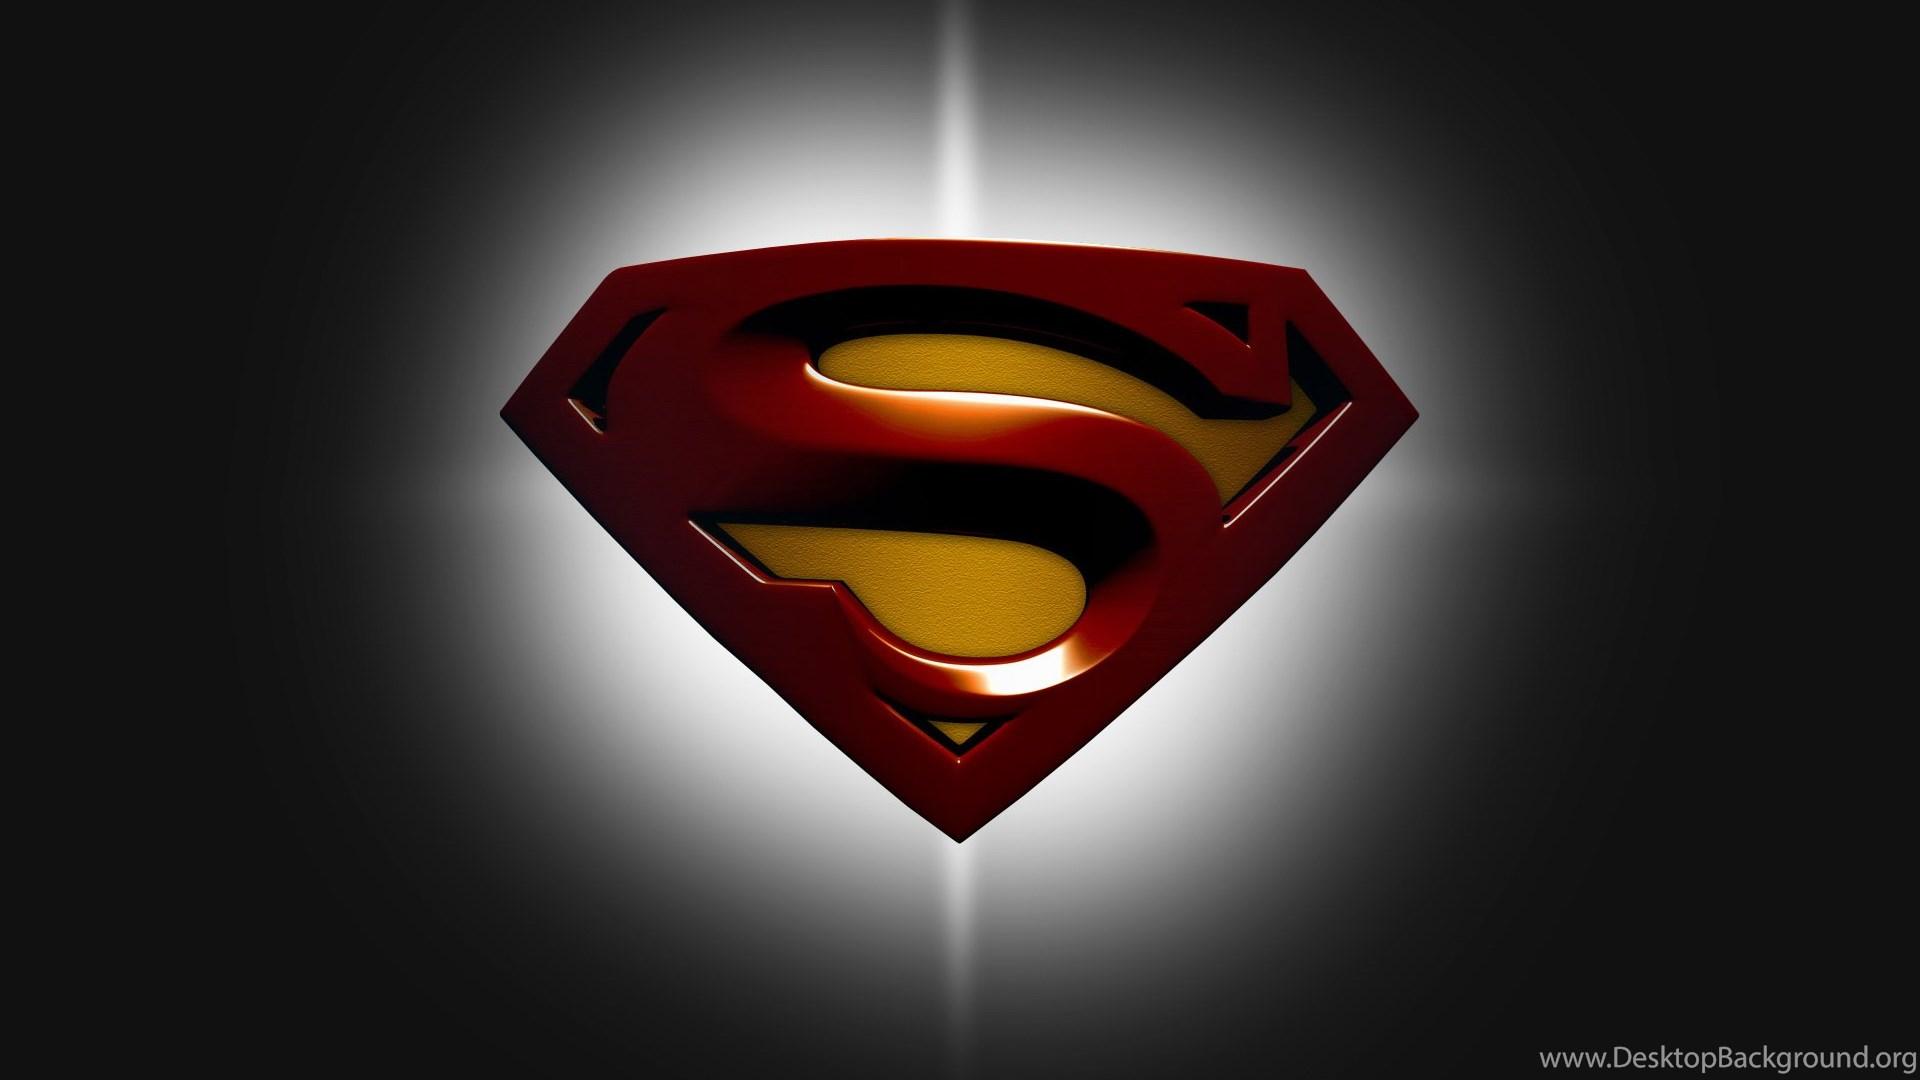 Download superman logo wallpapers 1080p desktop background popular voltagebd Gallery